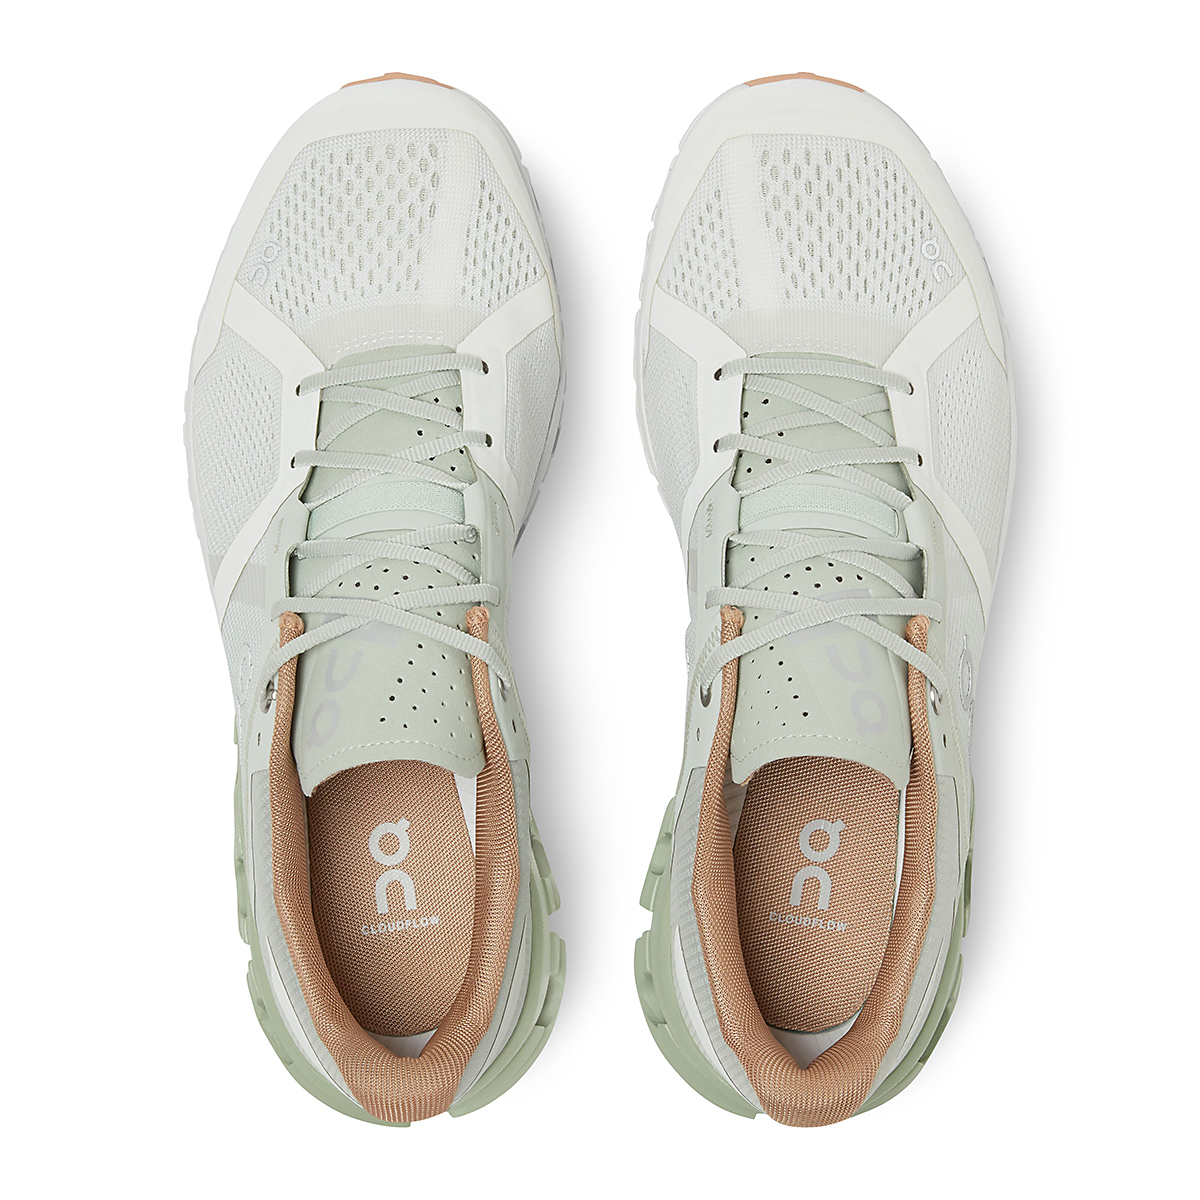 Women's On Cloudflow 2.0 Running Shoe - Color: Aloe/White - Size: 5 - Width: Regular, Aloe/White, large, image 3